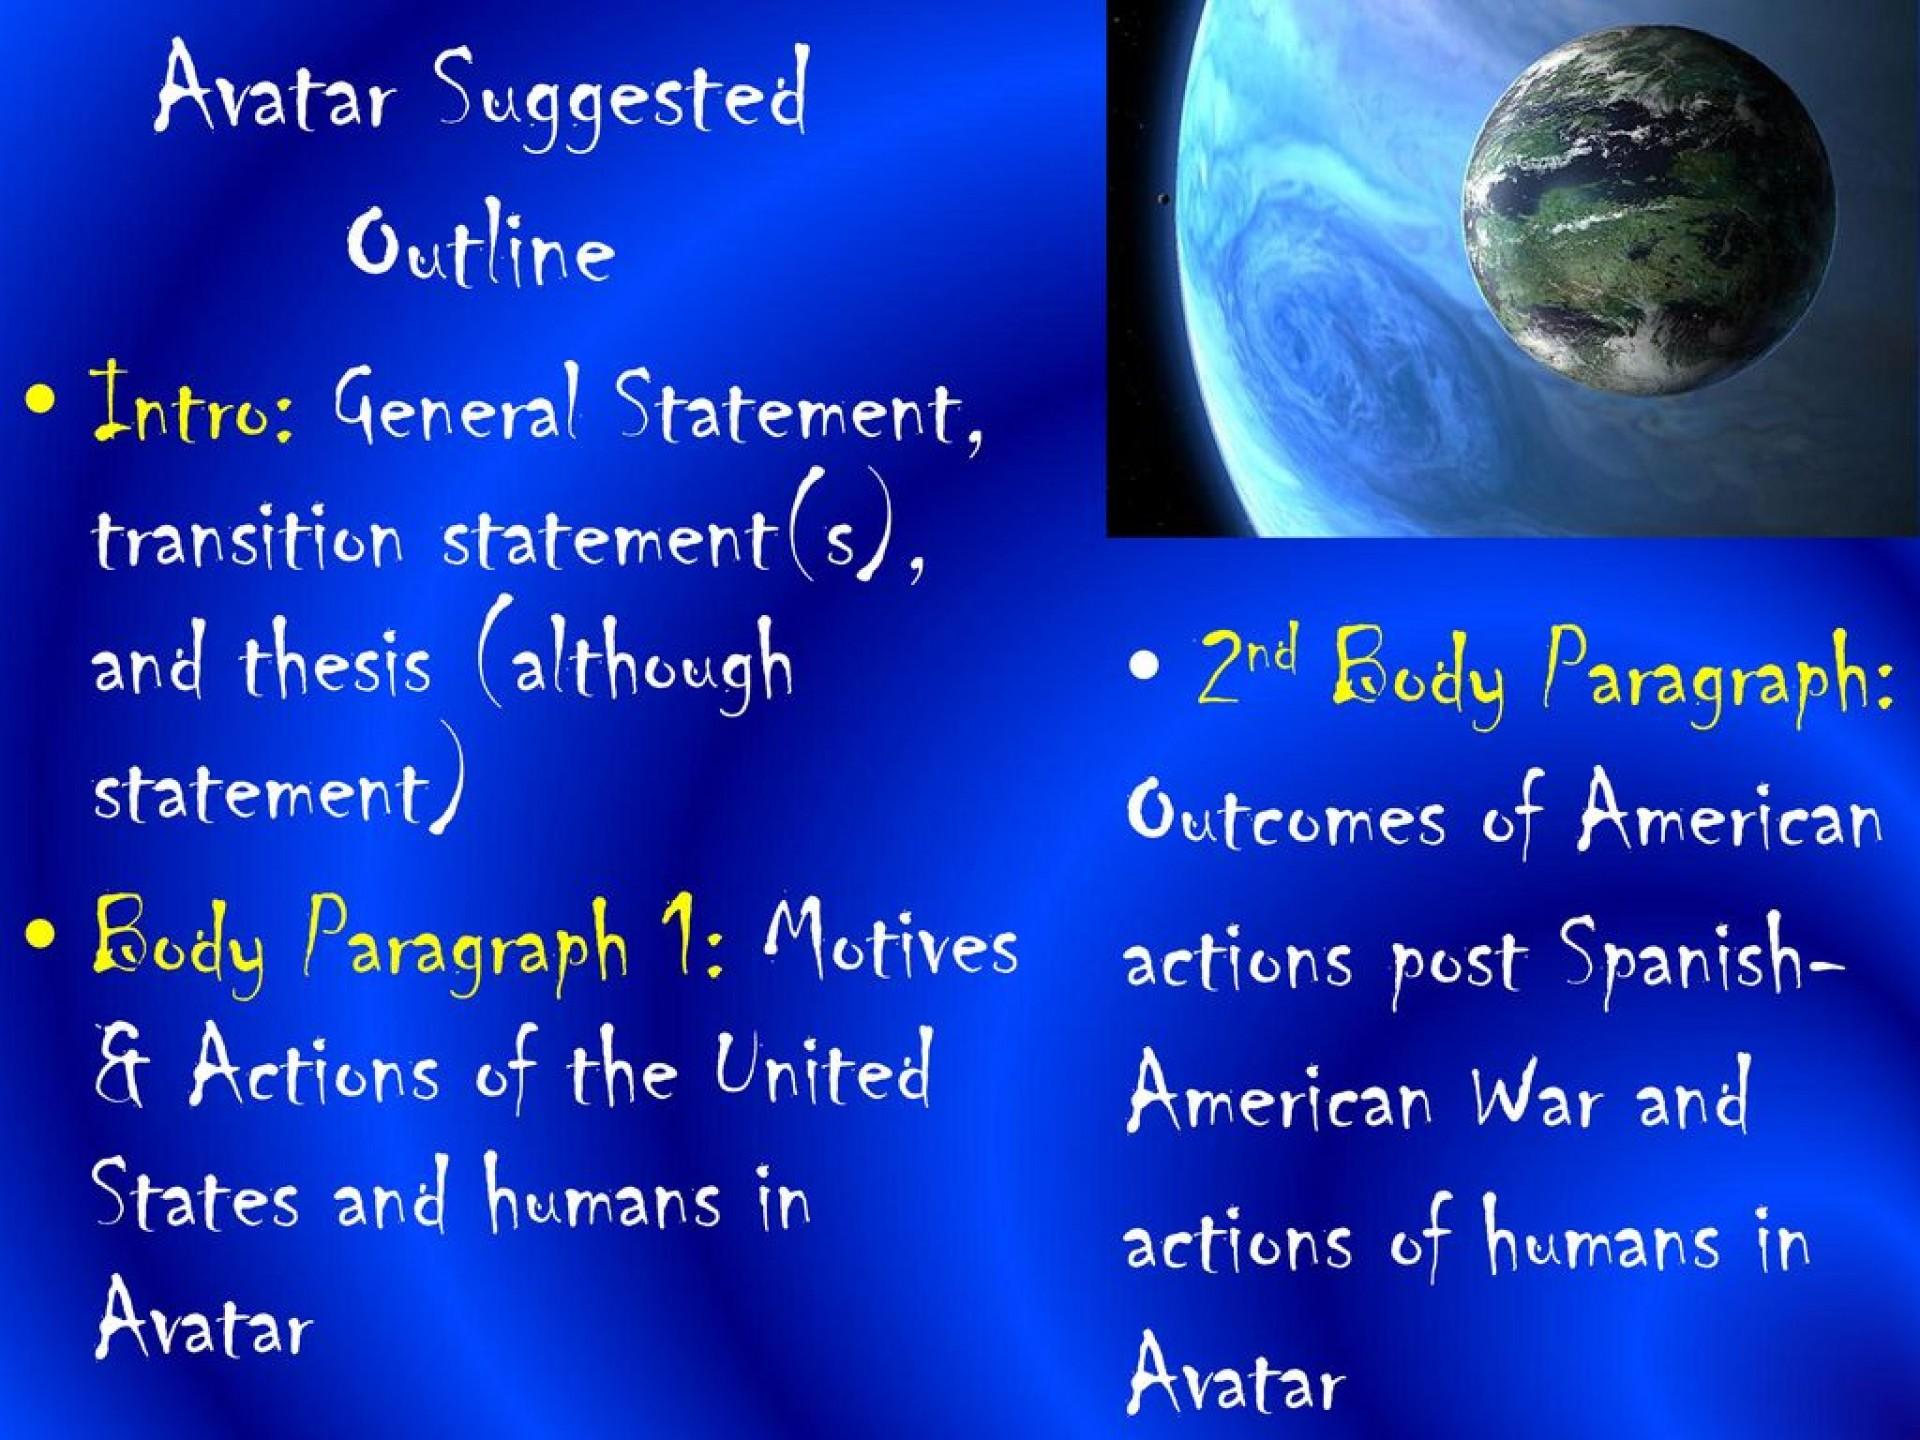 005 Avatarsuggestedoutline Essay Example Avatar Stirring Imperialism 1920